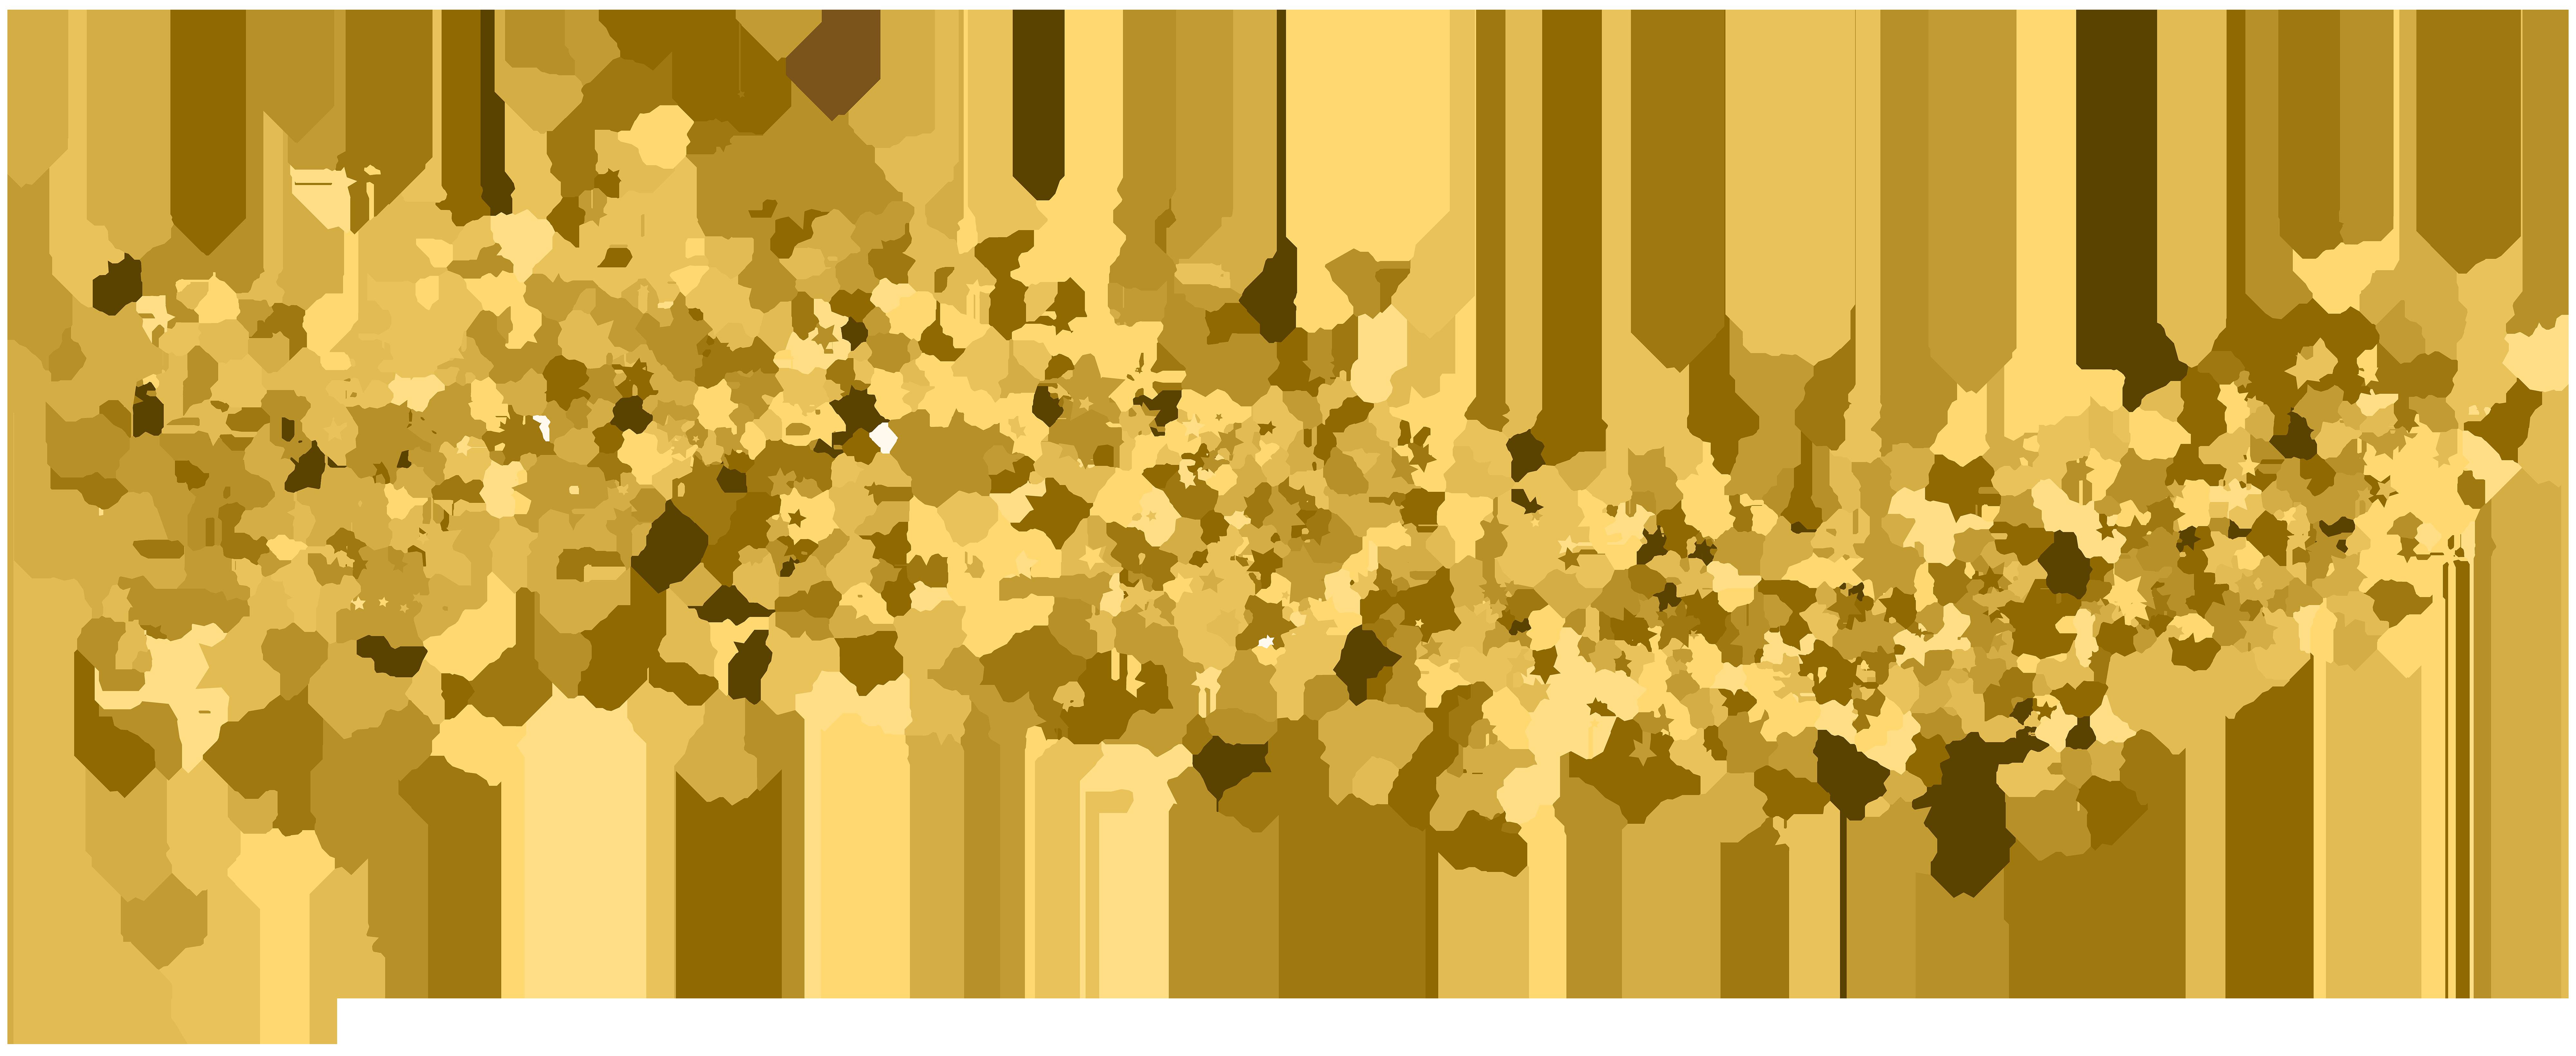 Deco Stars Transparent Clip Art Image | Gallery ... freeuse